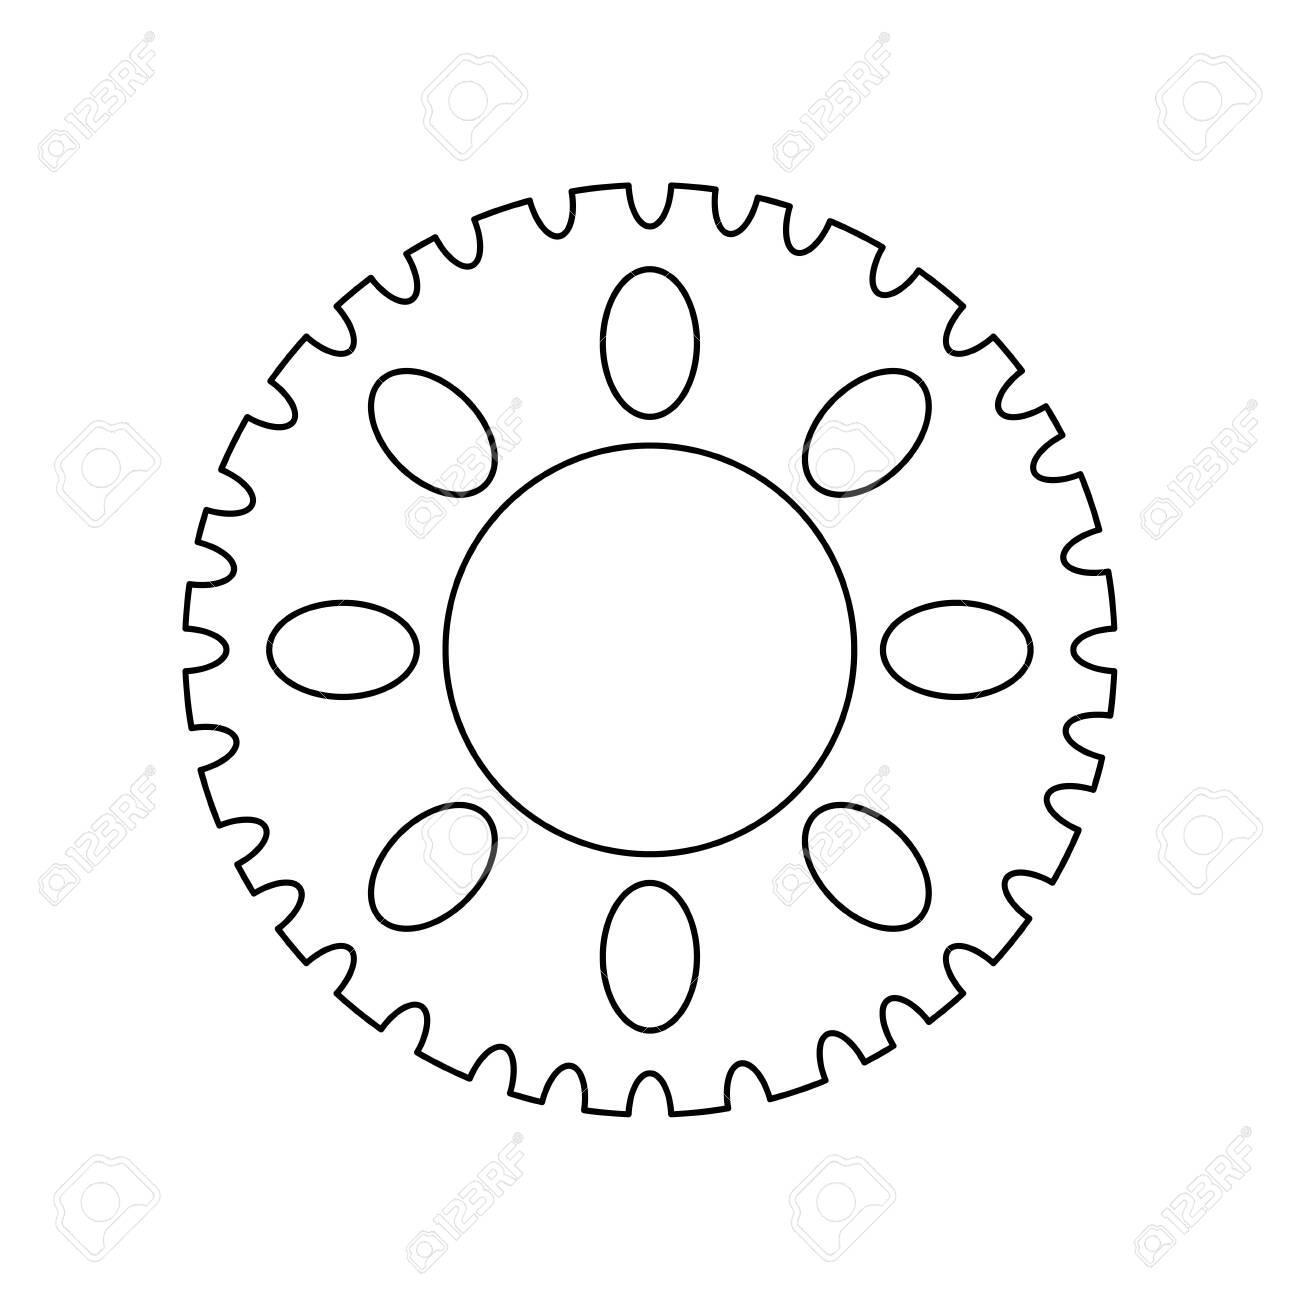 gear pinion machine isolated icon vector illustration design - 122605618